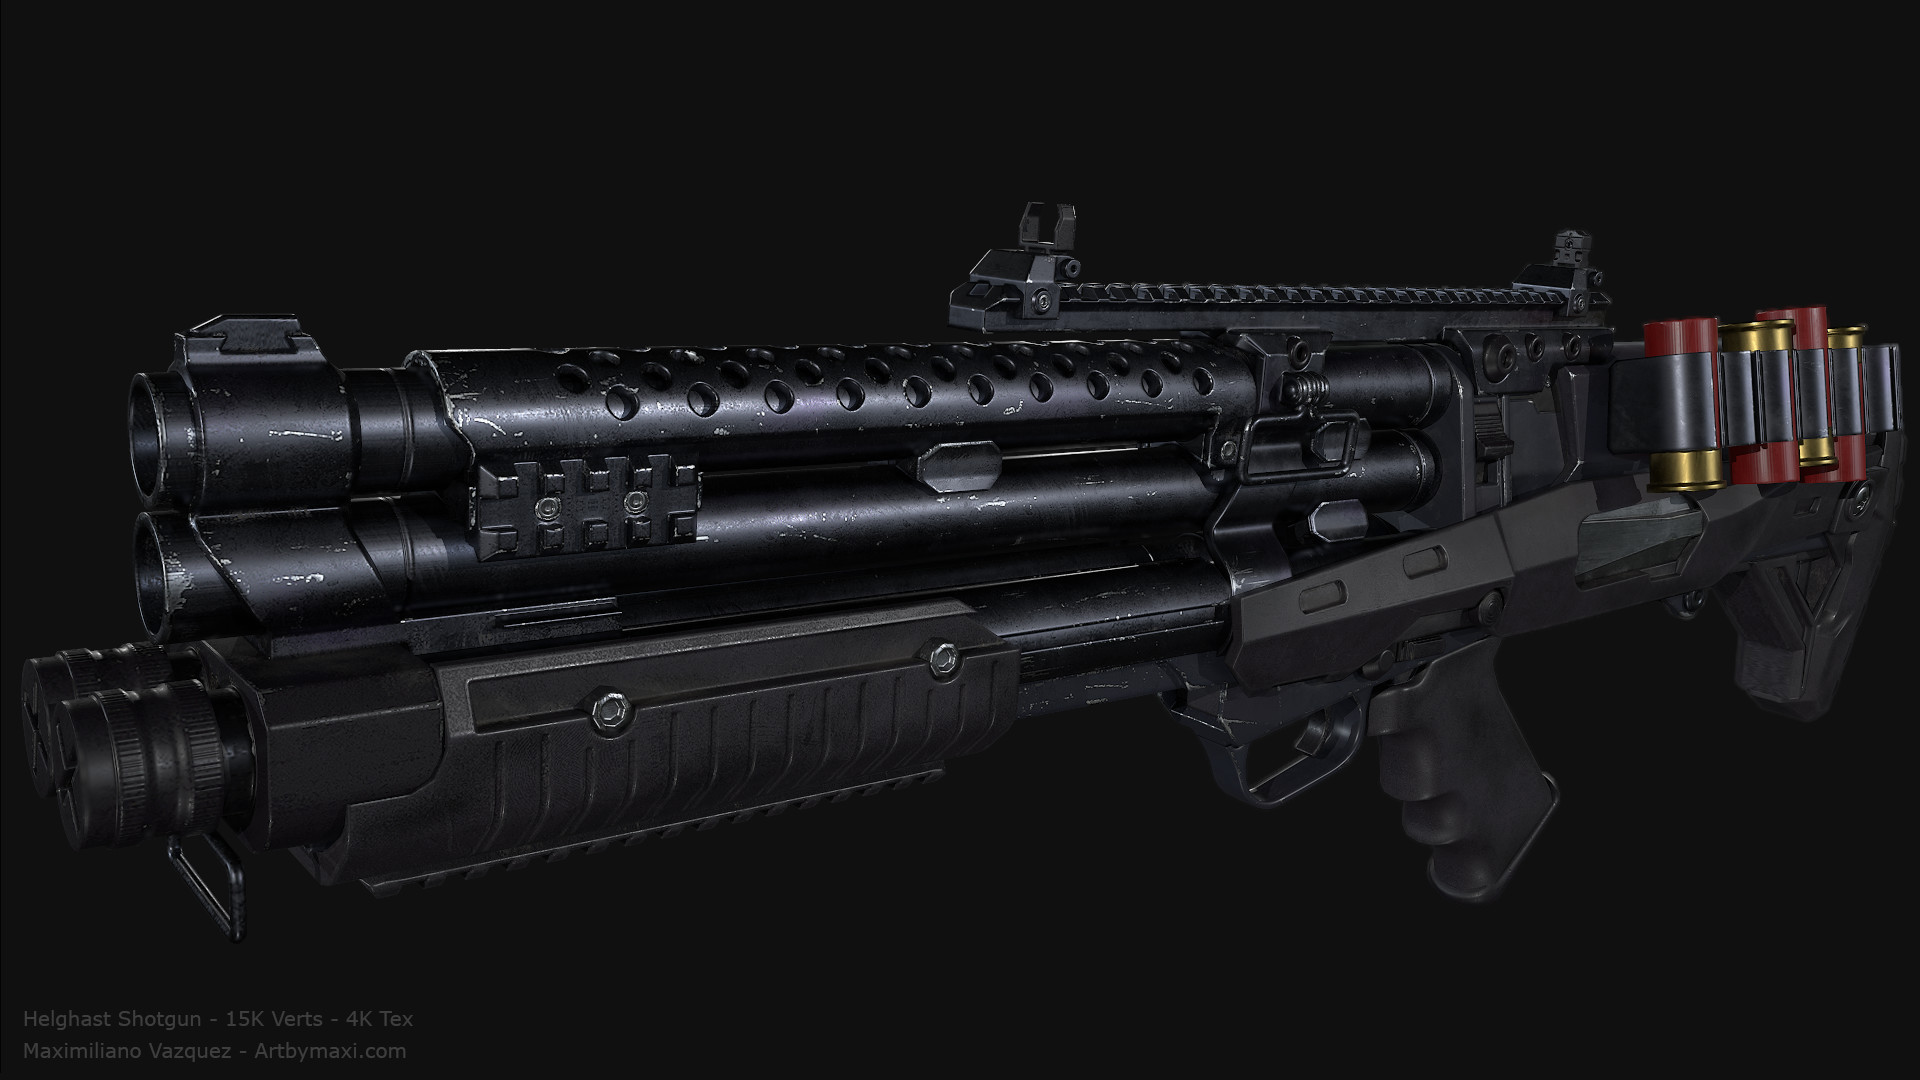 Maximiliano vazquez hellghast shotgun lp3